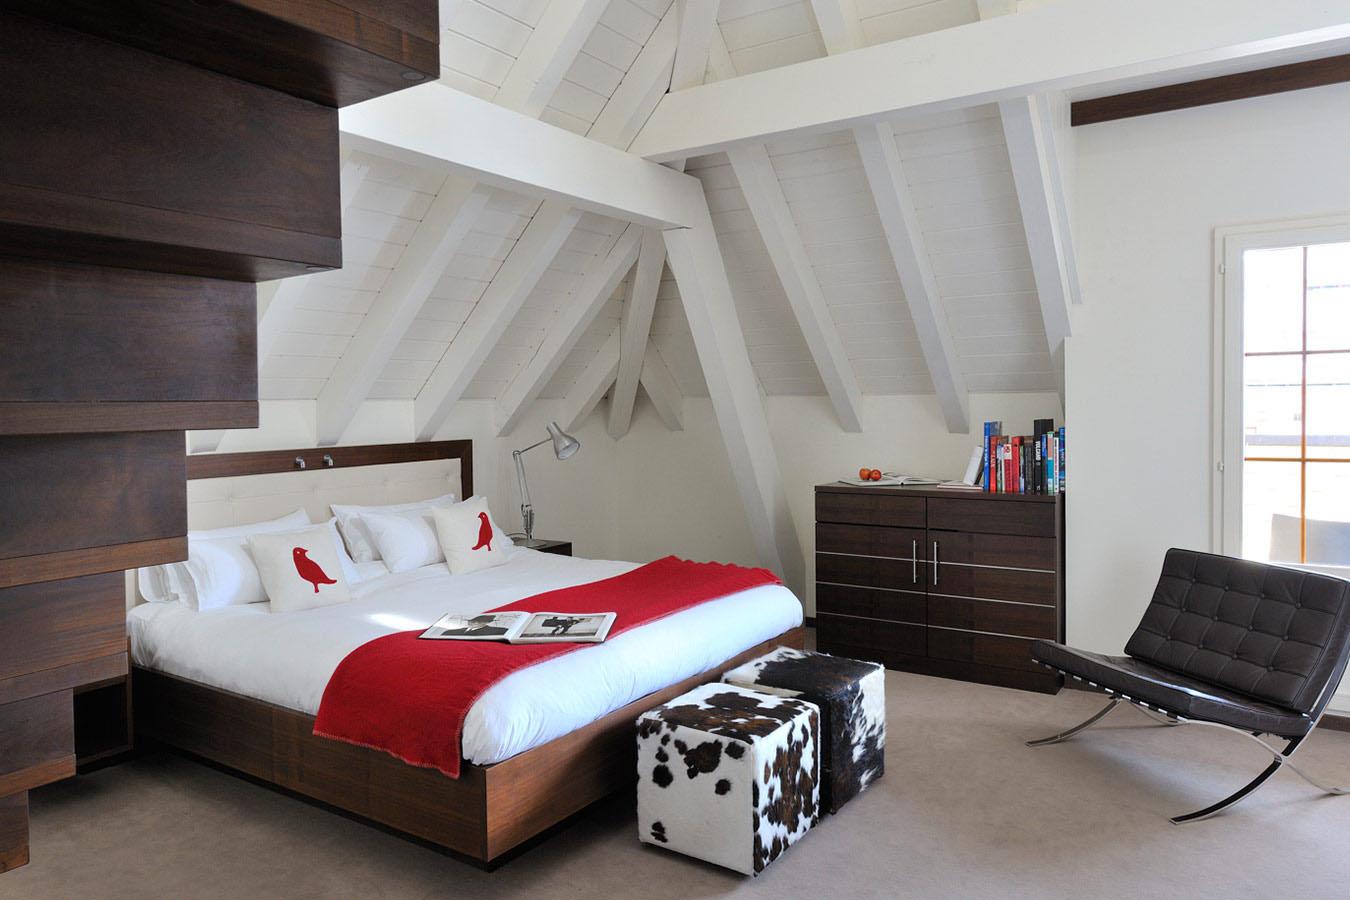 Swiss Alps Hotel Room